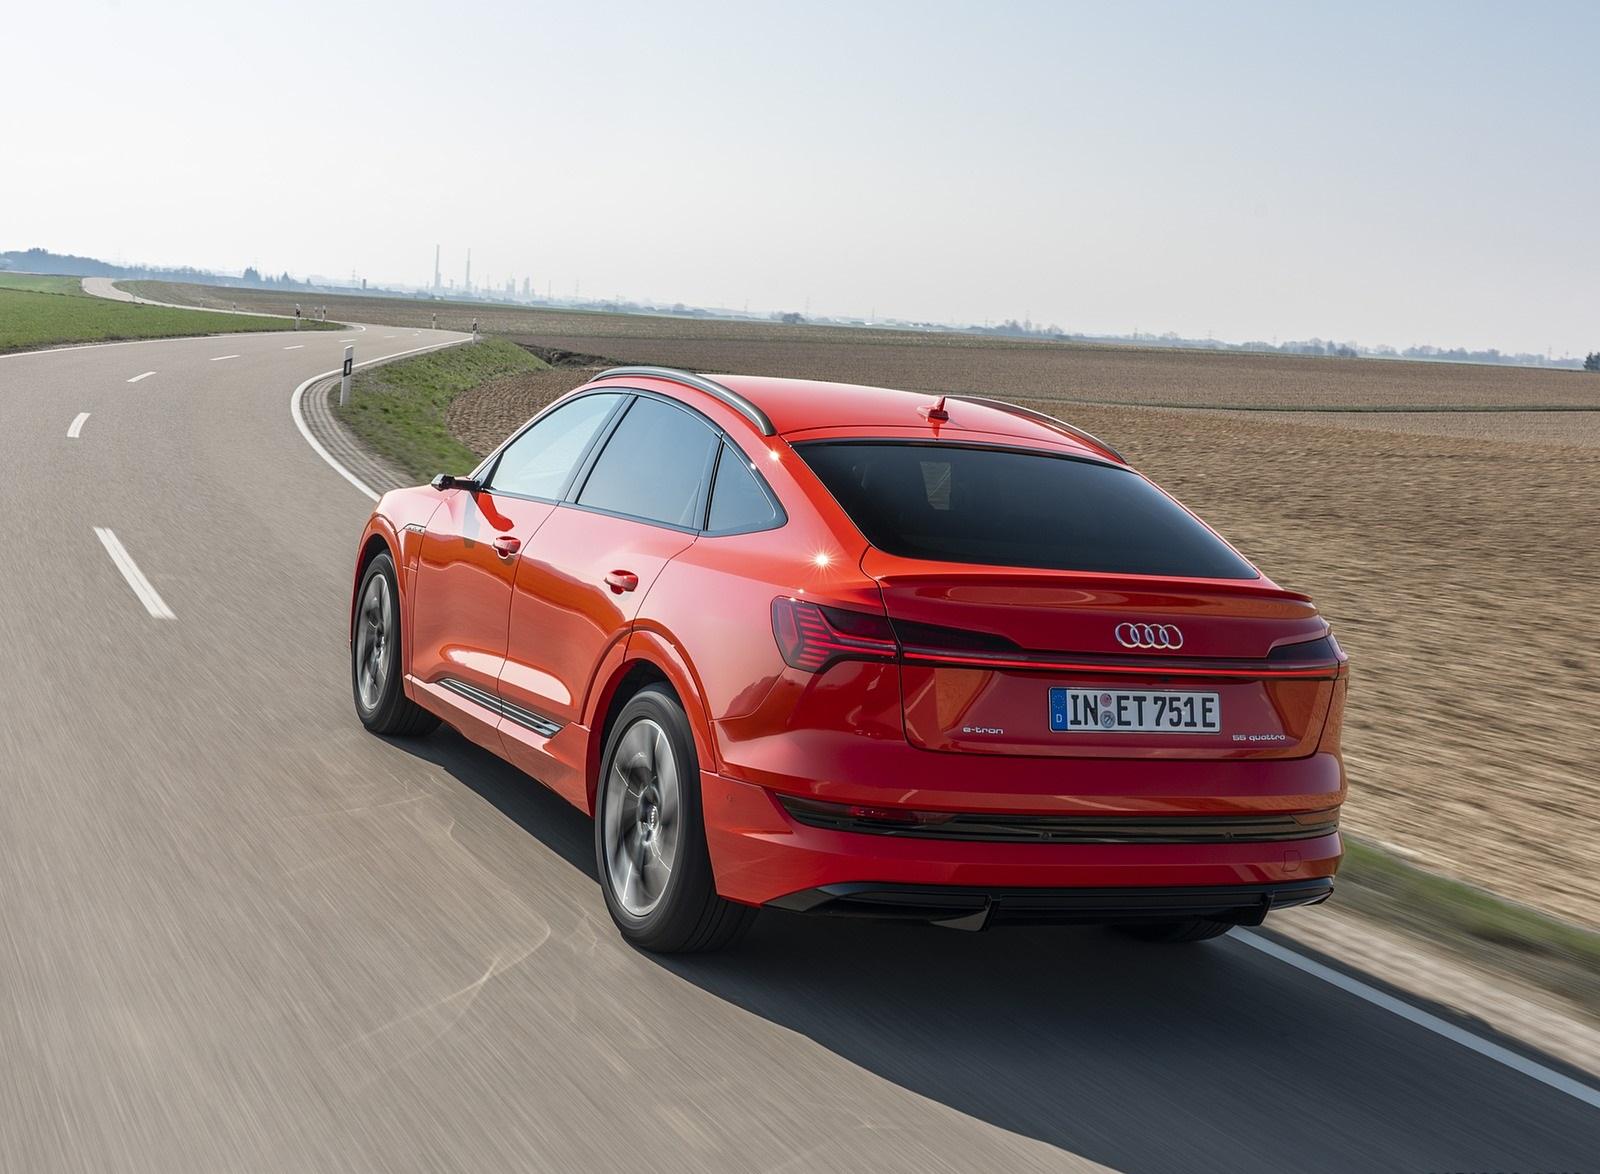 2020 Audi e-tron Sportback (Color: Catalunya Red) Rear Three-Quarter Wallpapers (7)